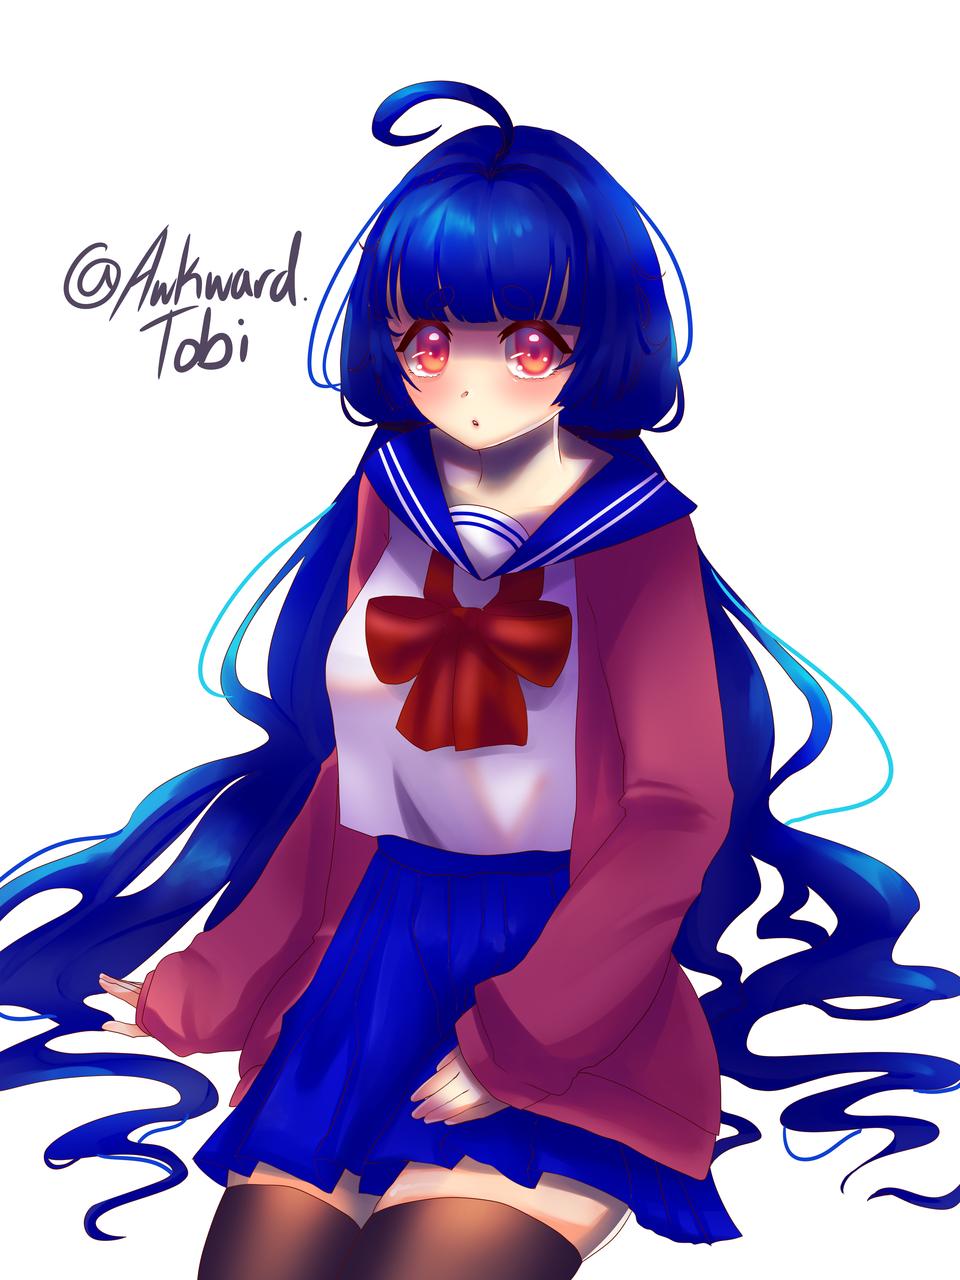 She's sitting Illust of AwkwardTobi kawaii illustration Artwork anime